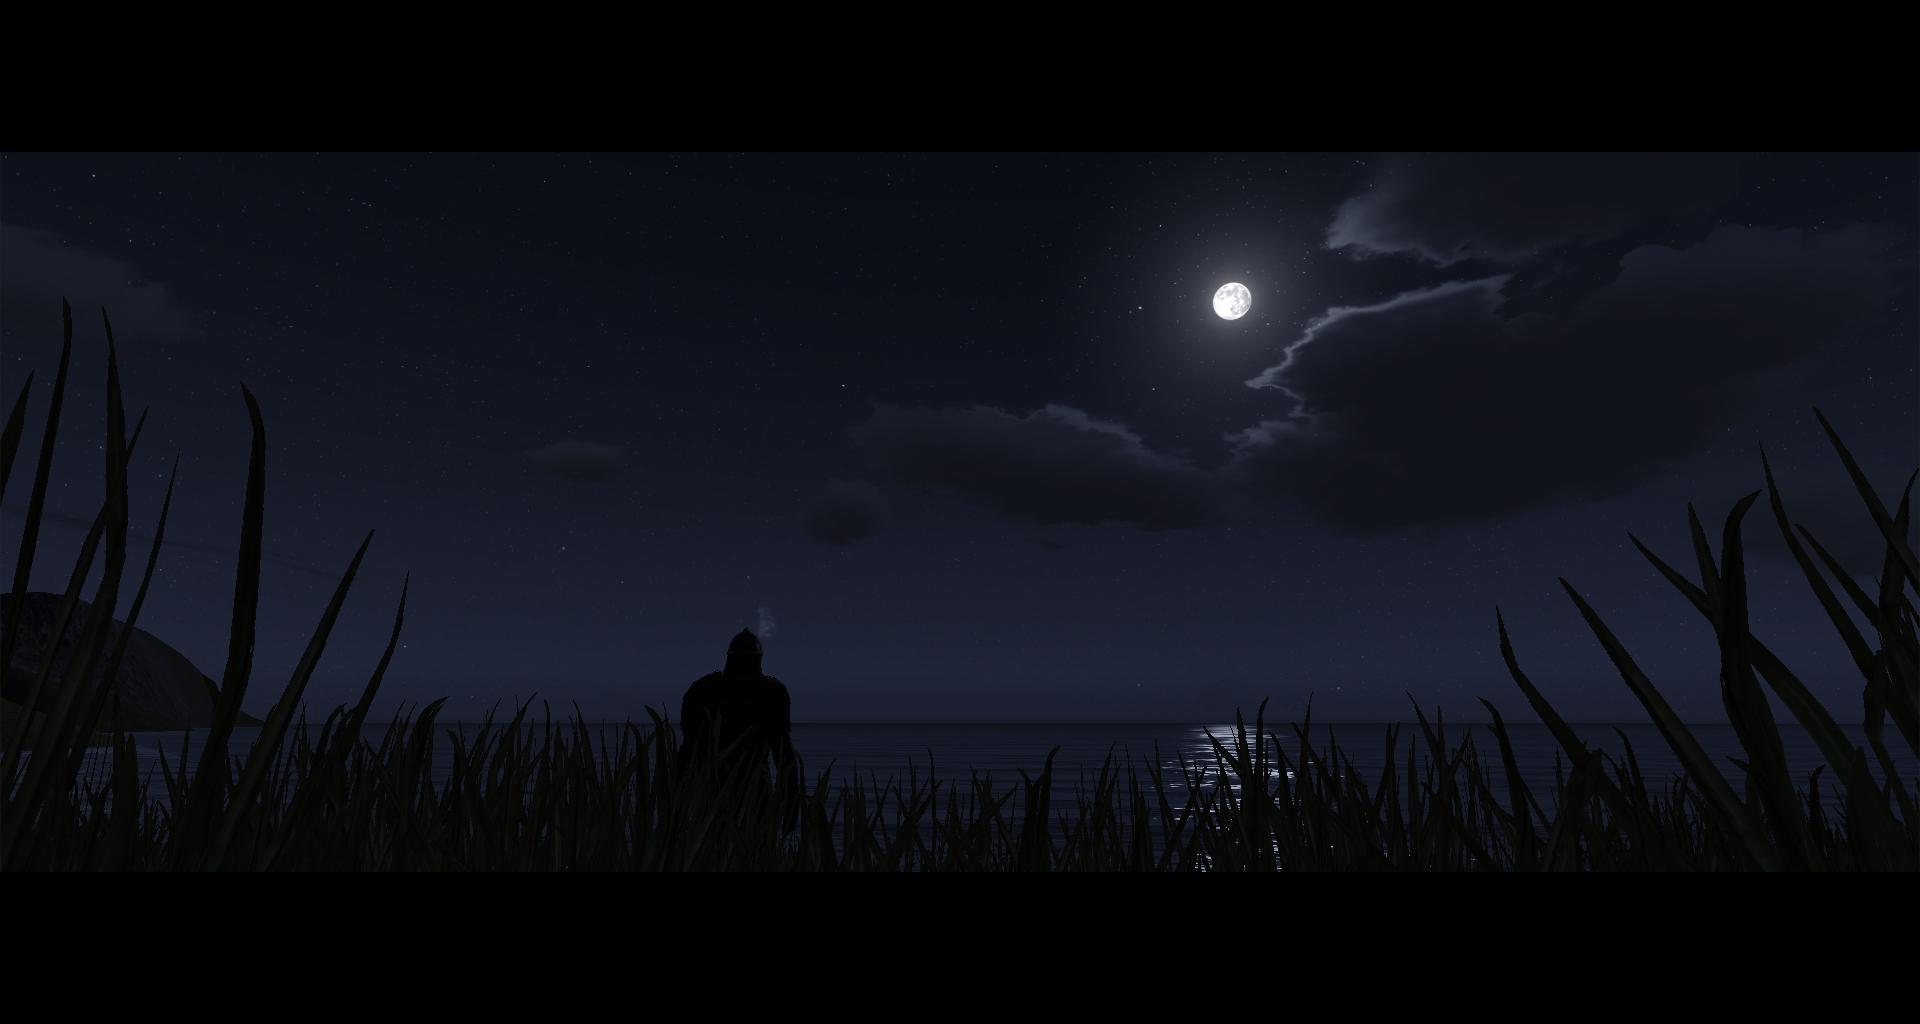 [Image: hqclouds_night1.jpg]